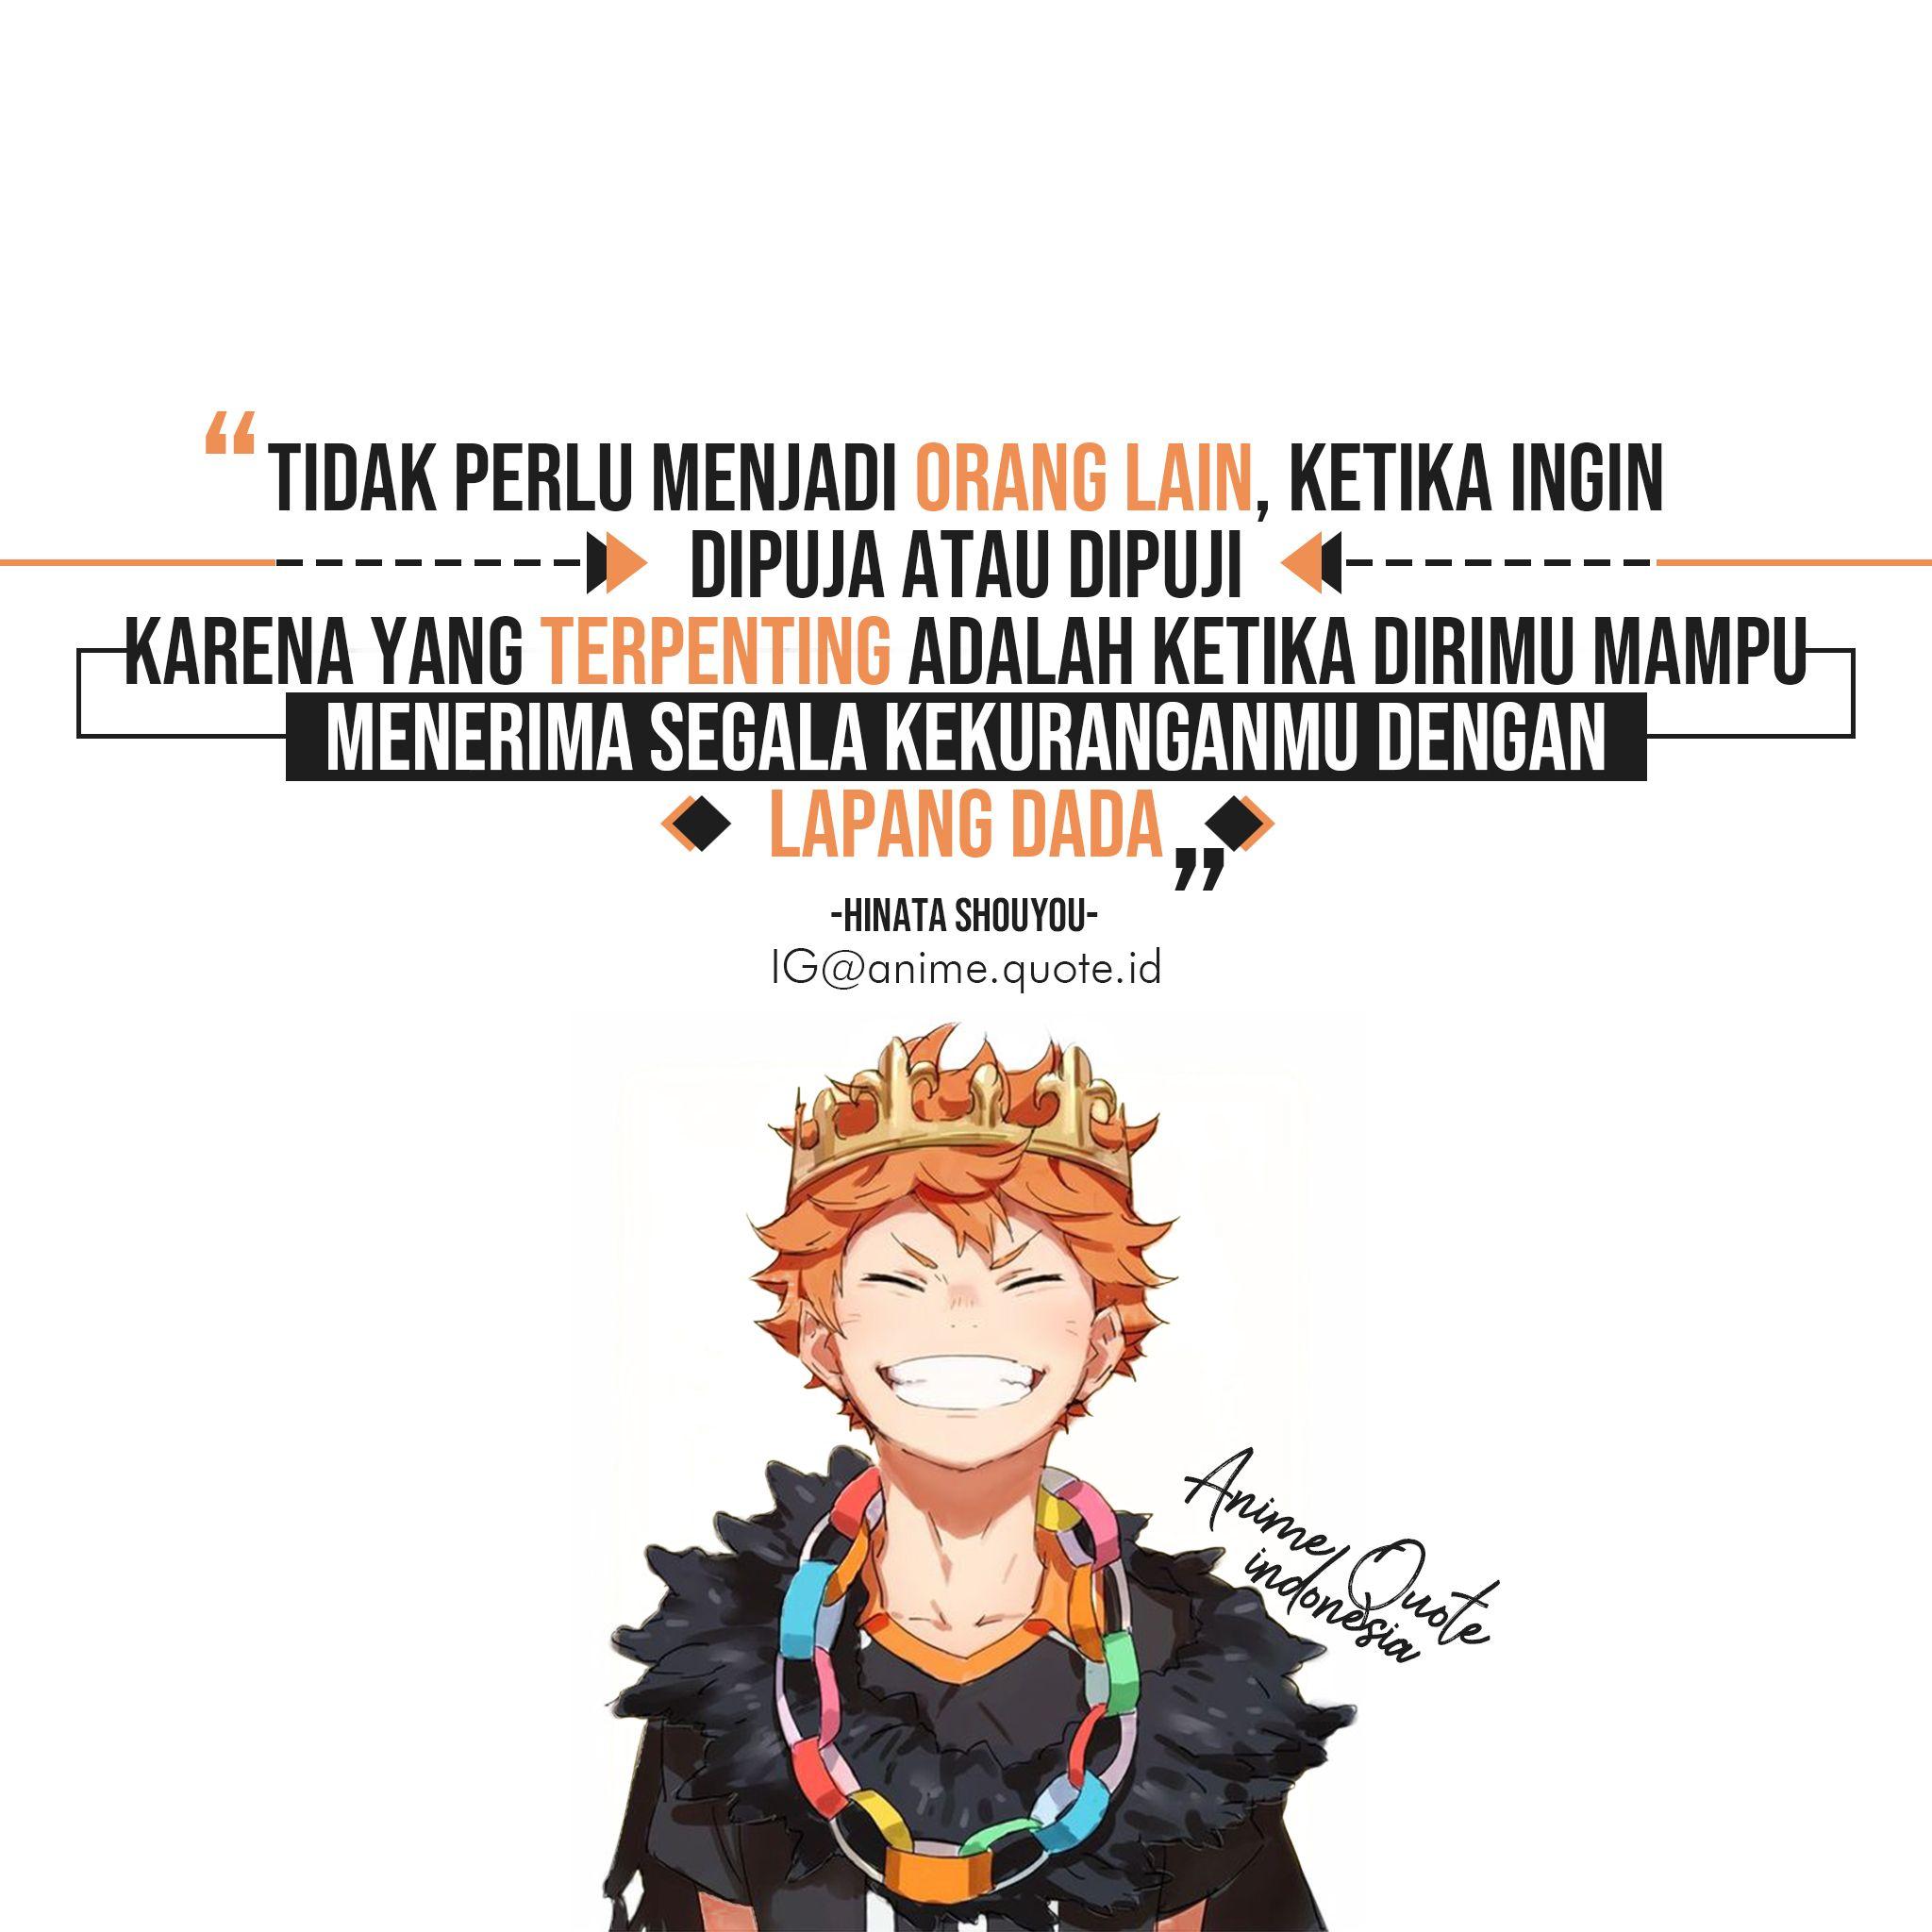 Anime Quote Indonesia Kata Kata Motivasi Motivasi Kata Kata